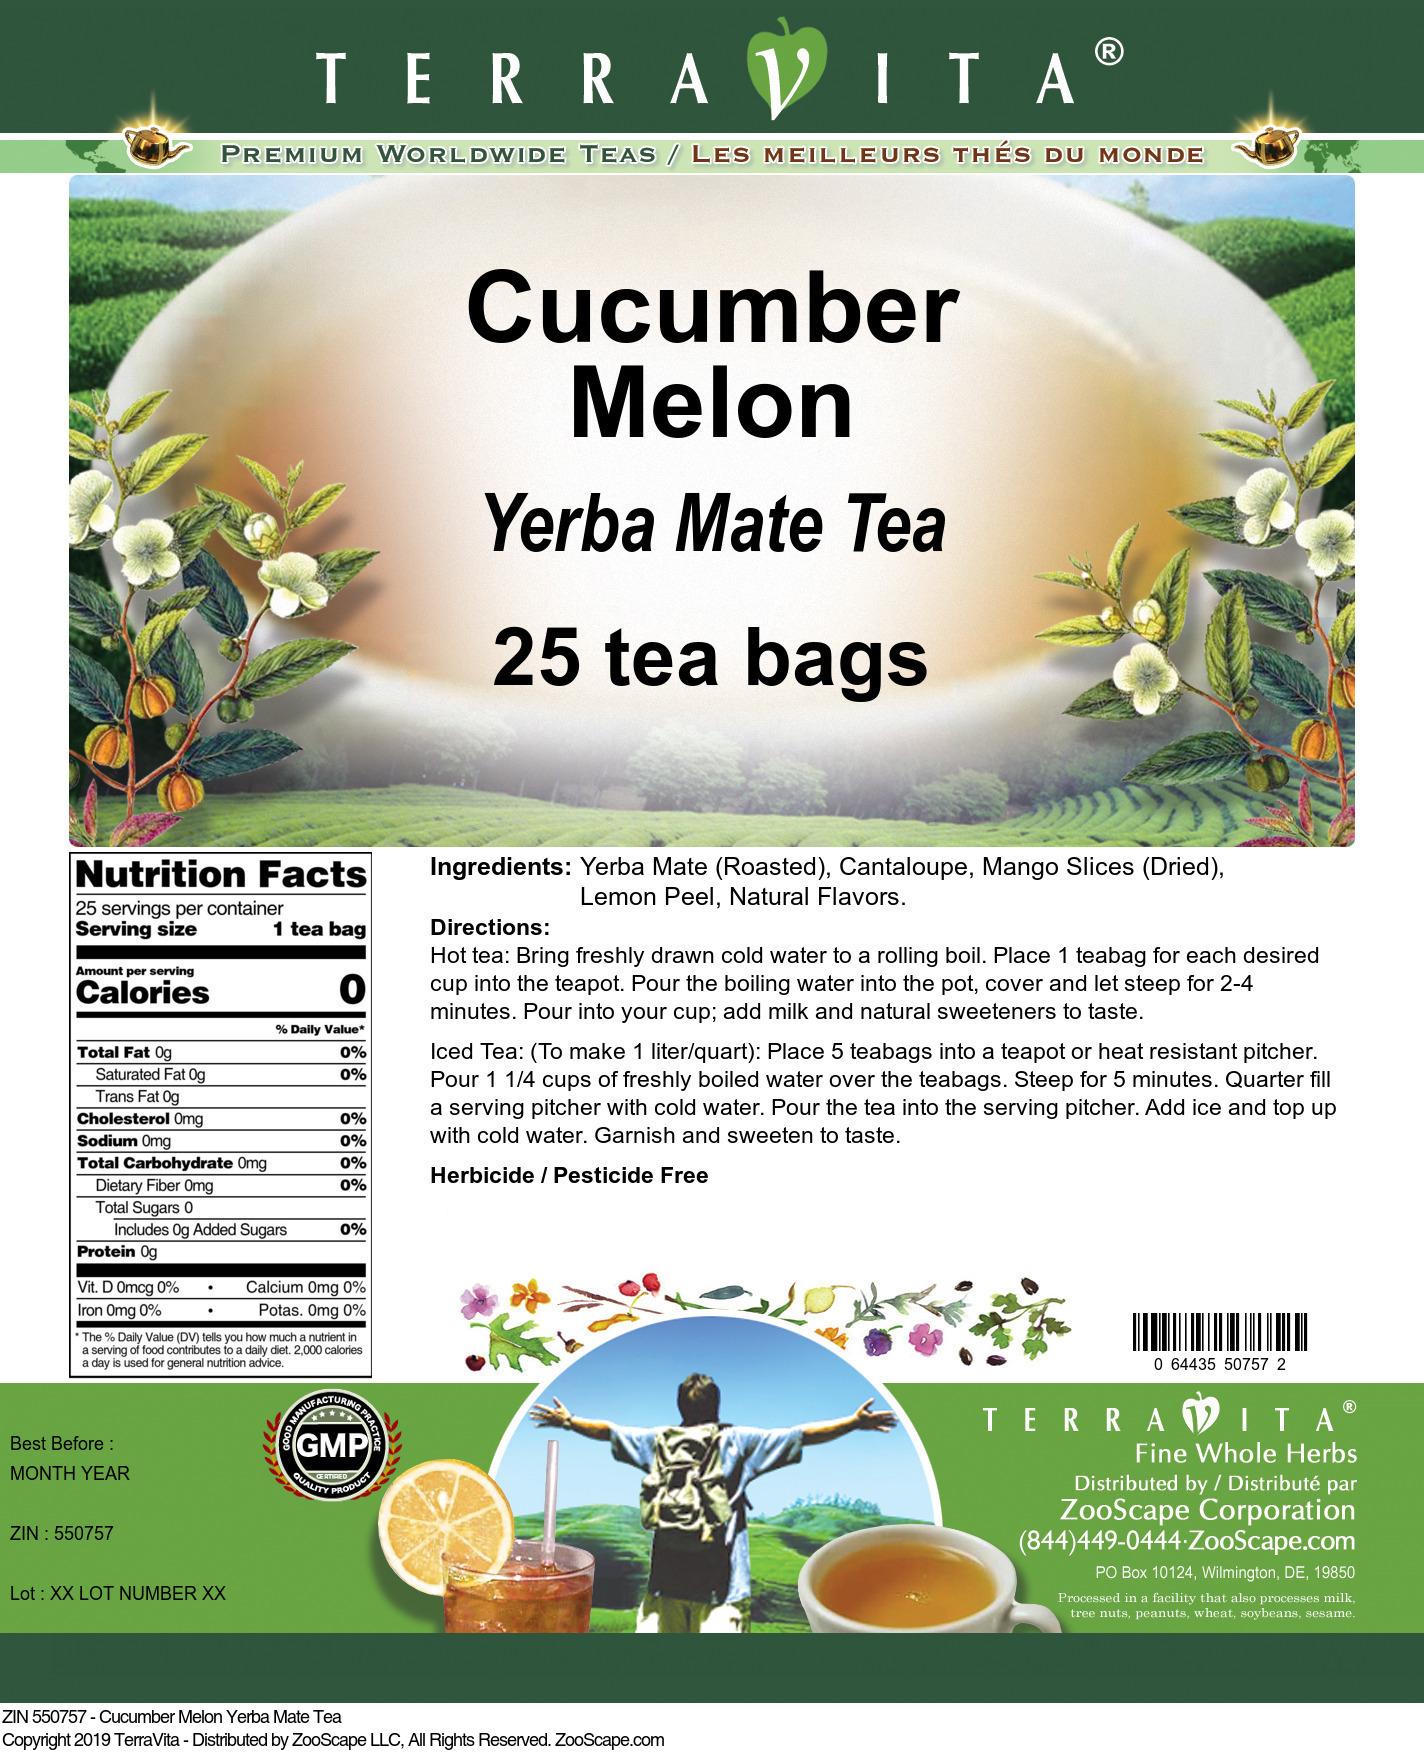 Cucumber Melon Yerba Mate Tea